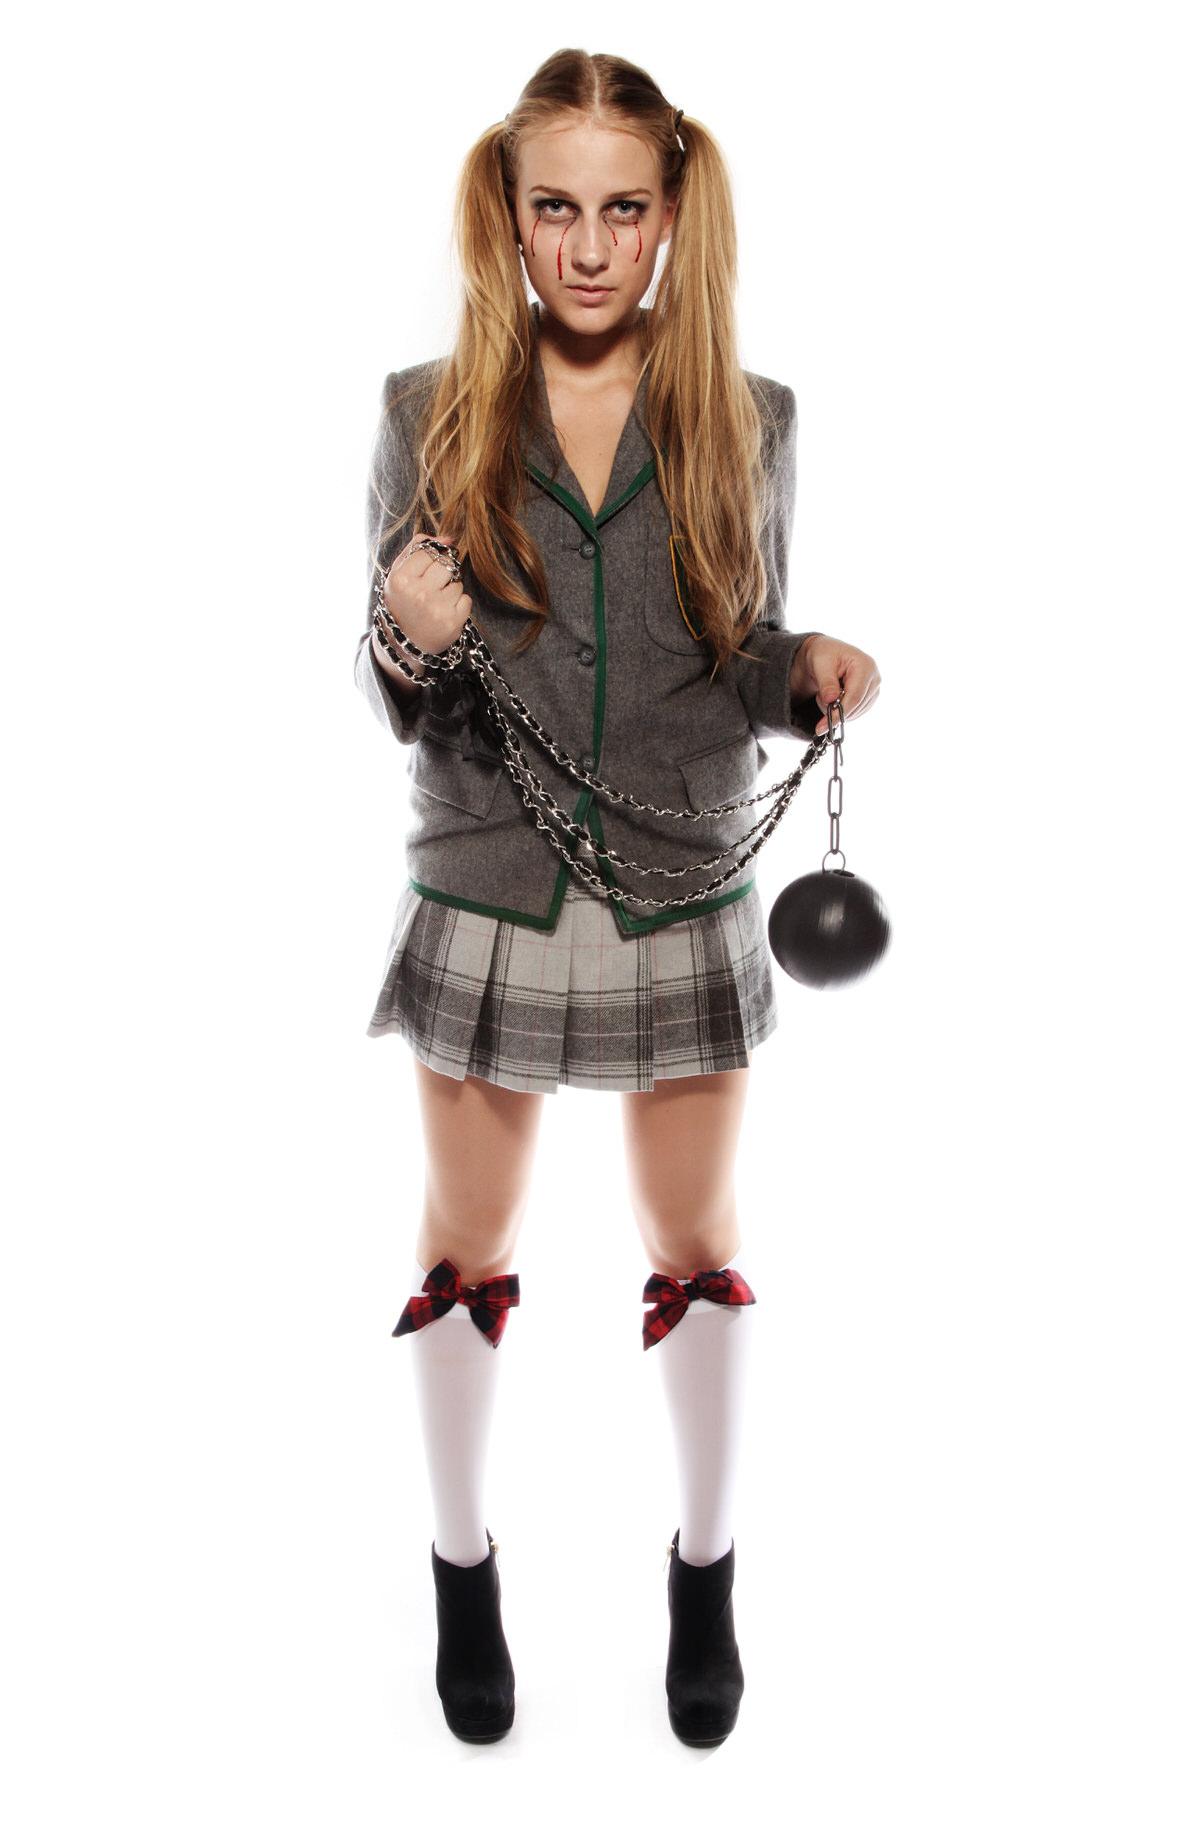 KILL BILL GO GO SCHOOL UNIFORM COSTUME